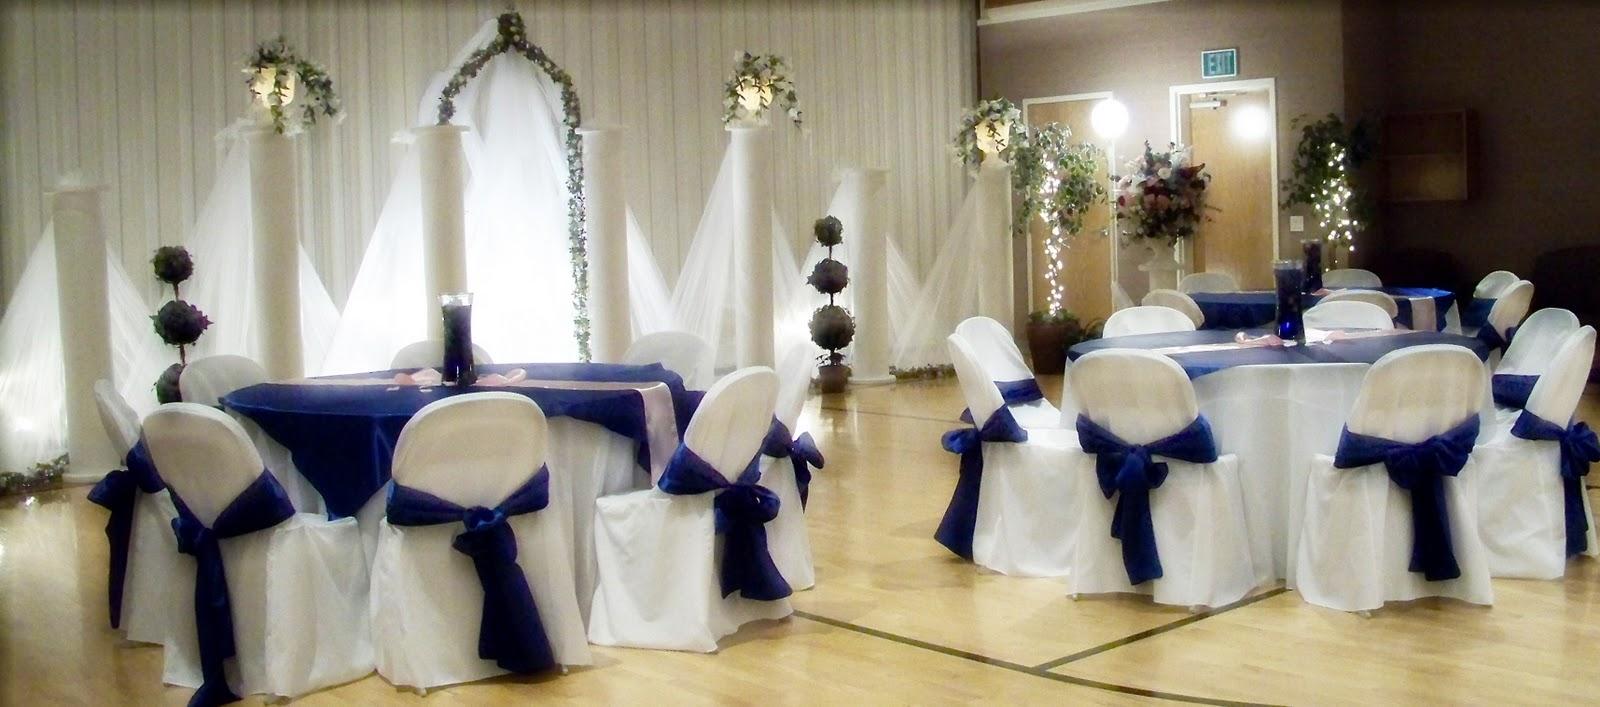 Royal+Blue+Backdrop - Royal Wedding Backdrop